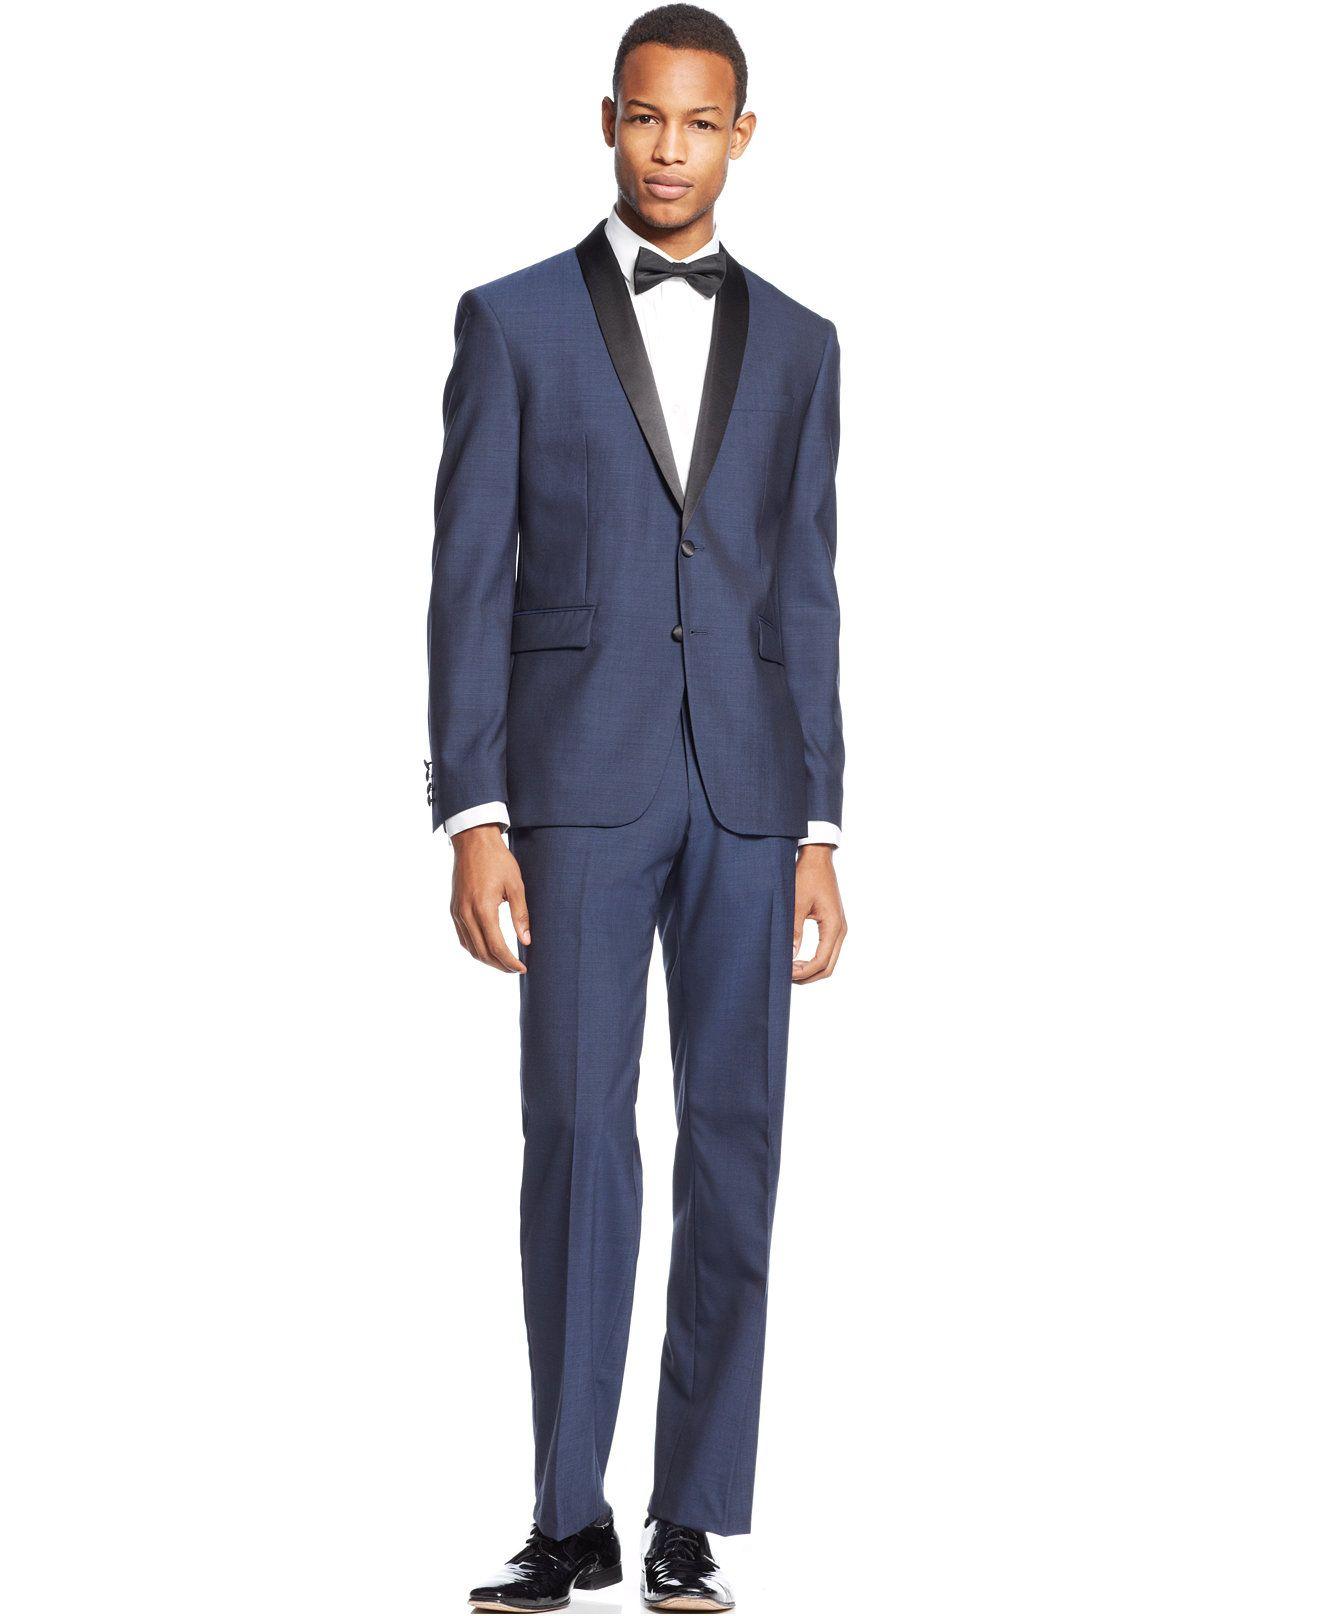 Bar III Slim-Fit Midnight Blue Shawl Collar Tuxedo Separates ...